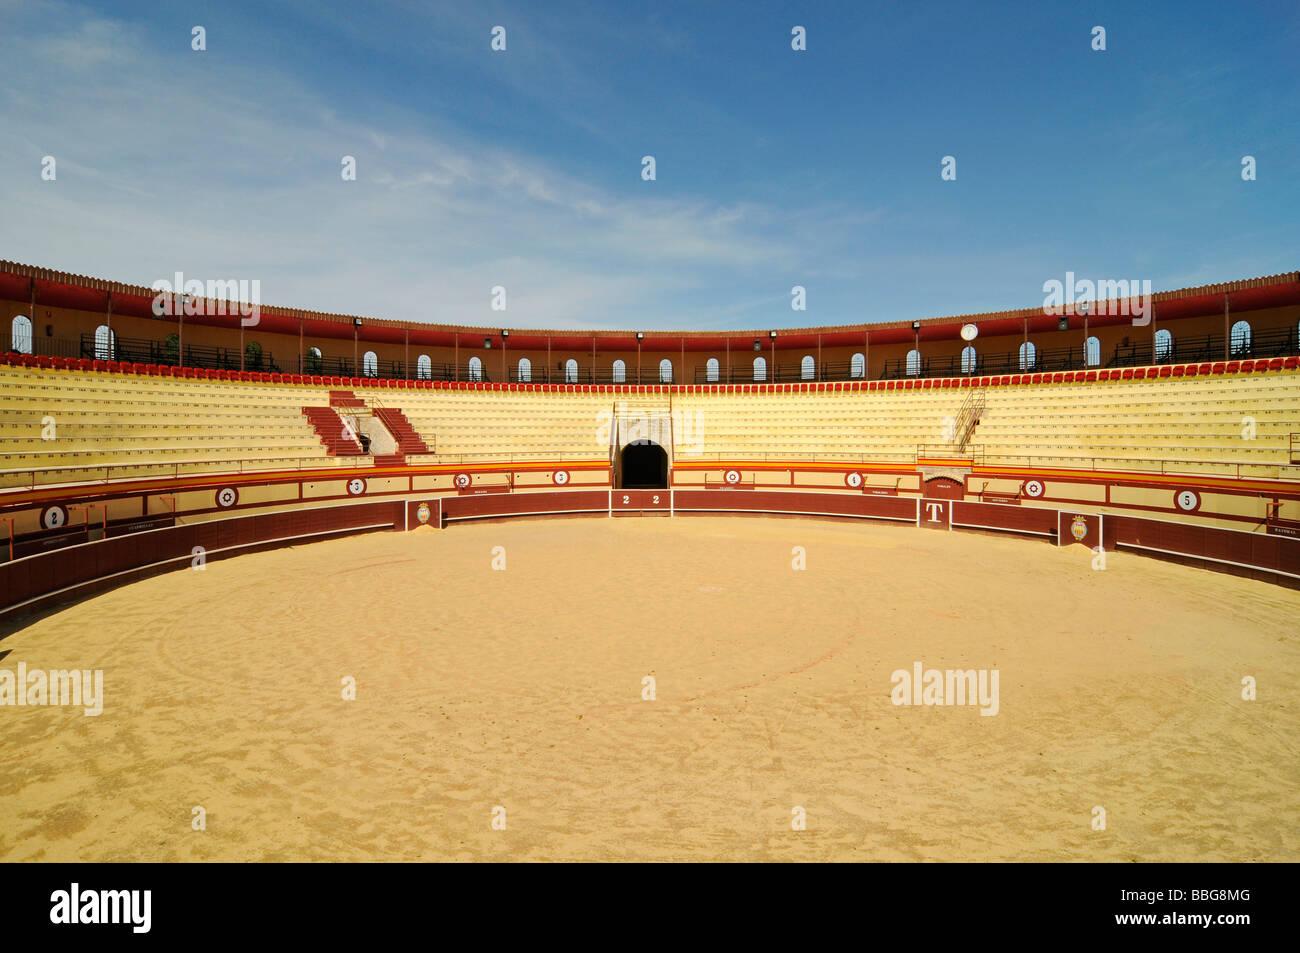 Bullring, bullfighting, arena, Monovar, Alicante, Spain, Europe - Stock Image